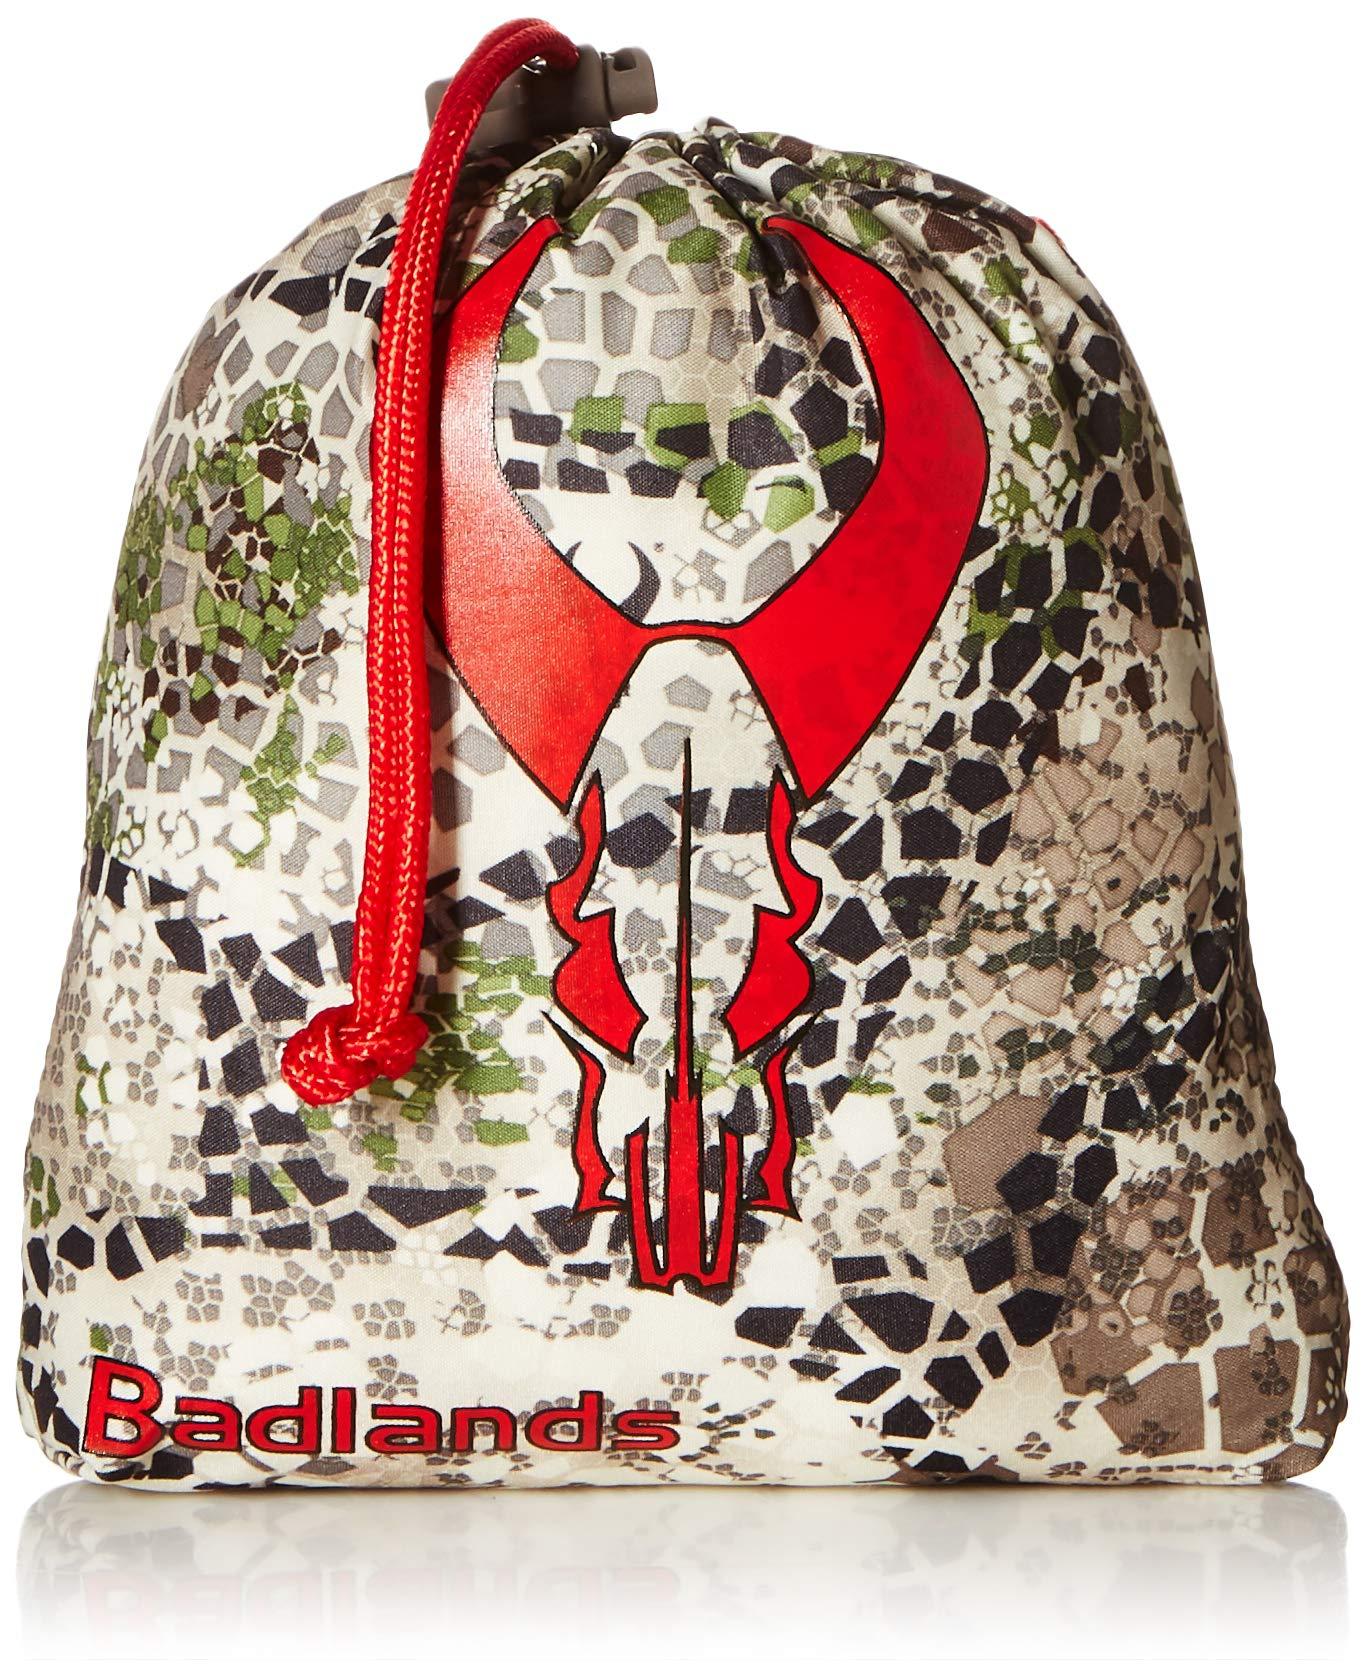 Badlands Waterproof Rain Cover for Hunting Backpacks, Approach, Medium